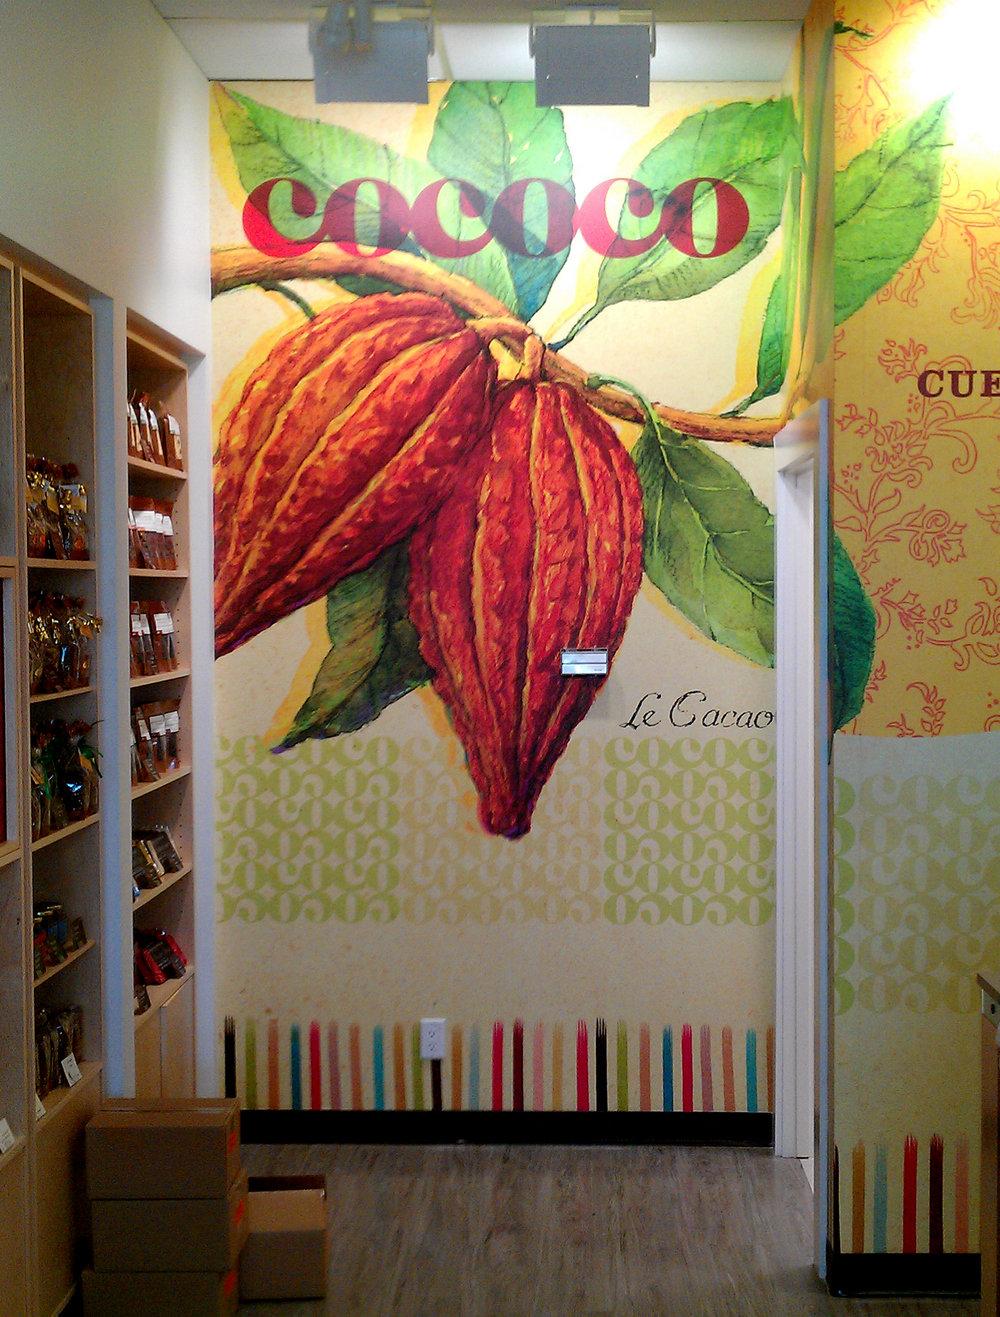 Cococo Wallpaper CCC.jpg